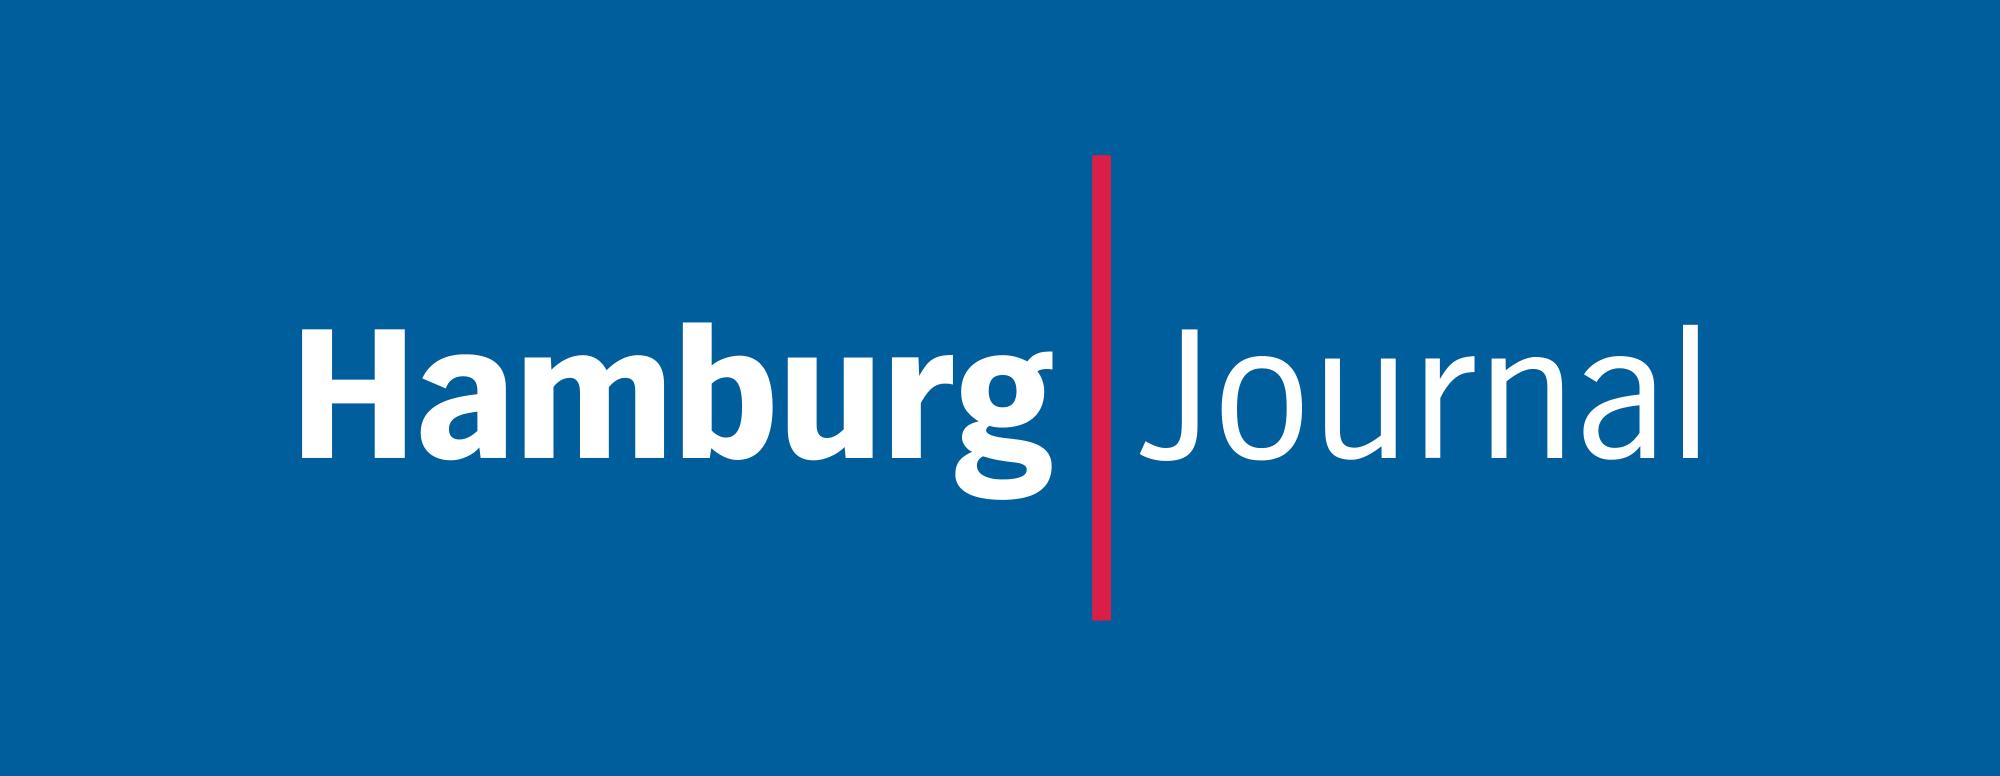 Hamburg-Journal-Logo-svg